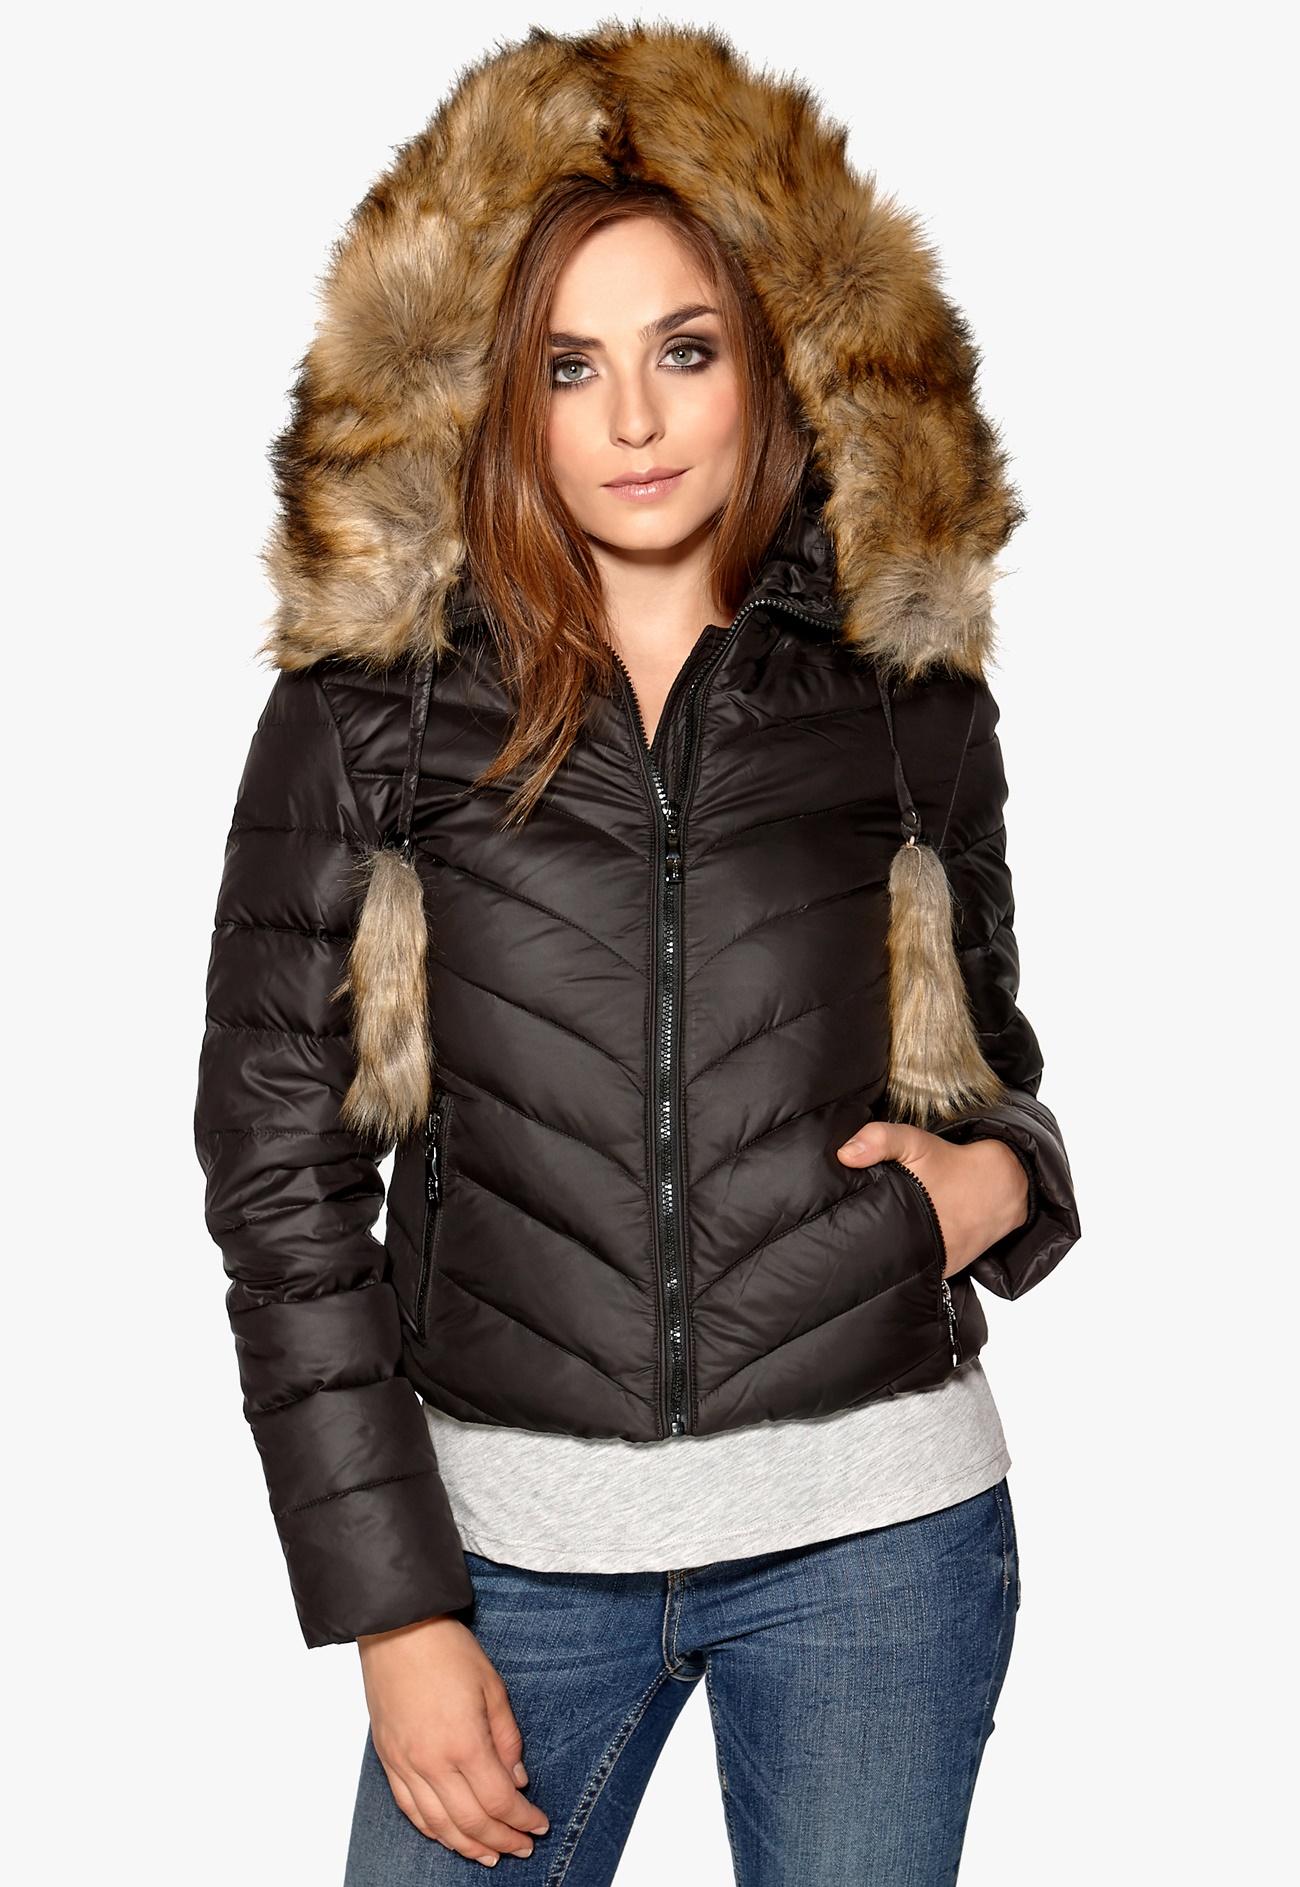 Hollies Aspen Short Down Jacket Black - Bubbleroom